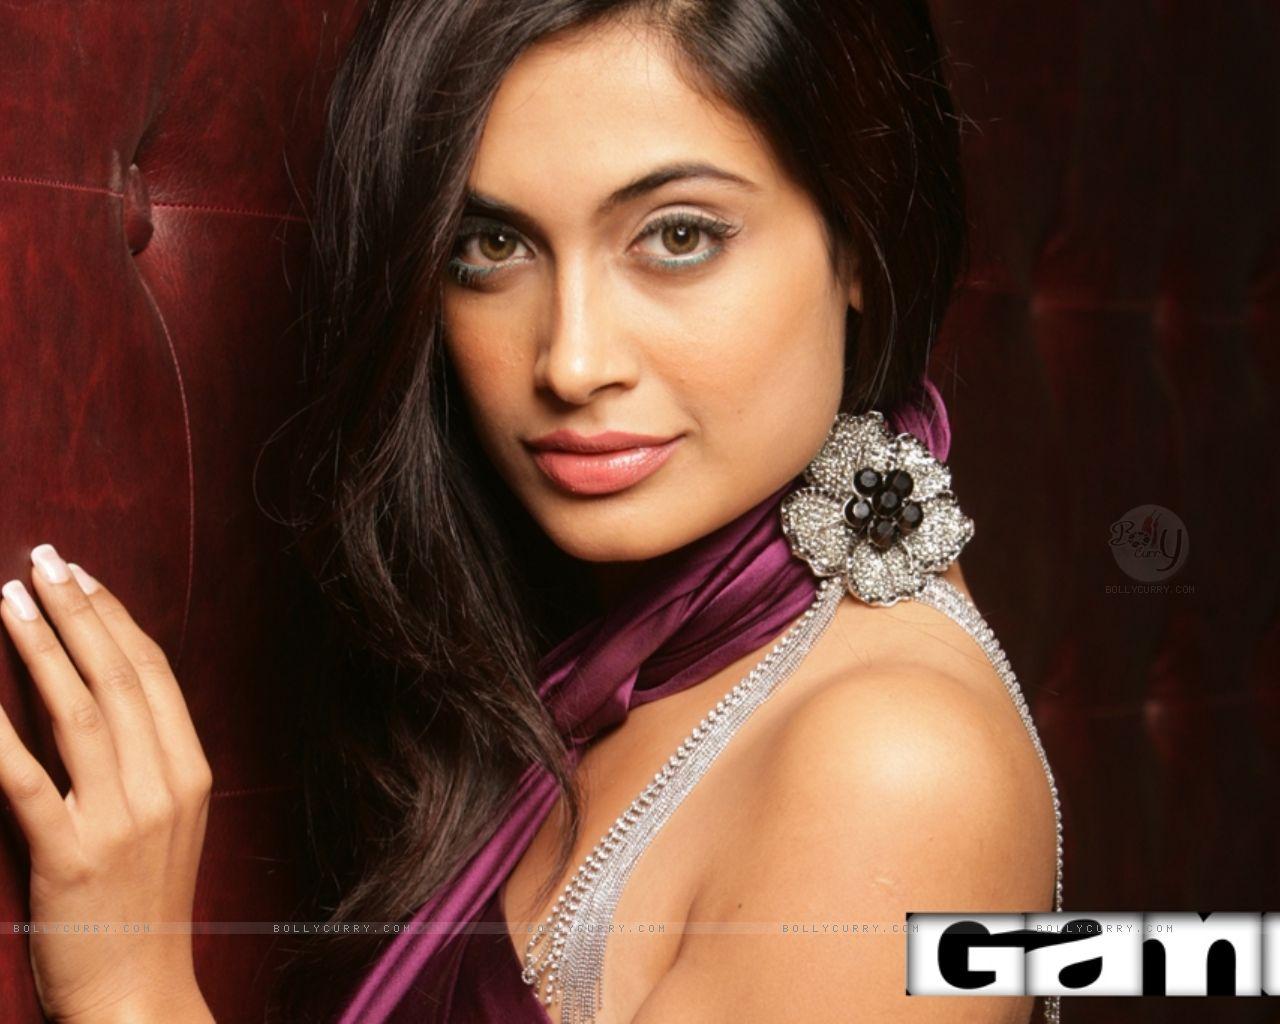 Boy Girl Kiss Hd Wallpaper Bollywood Acterss Images Sara Jane Dias Images